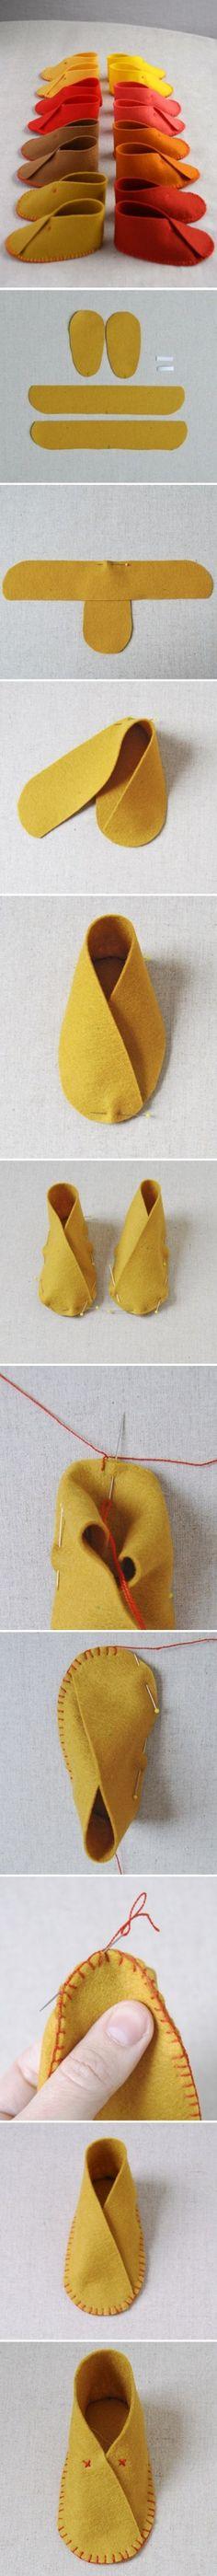 DIY : The Cutest Felt Baby Shoes by debbie.rose.37